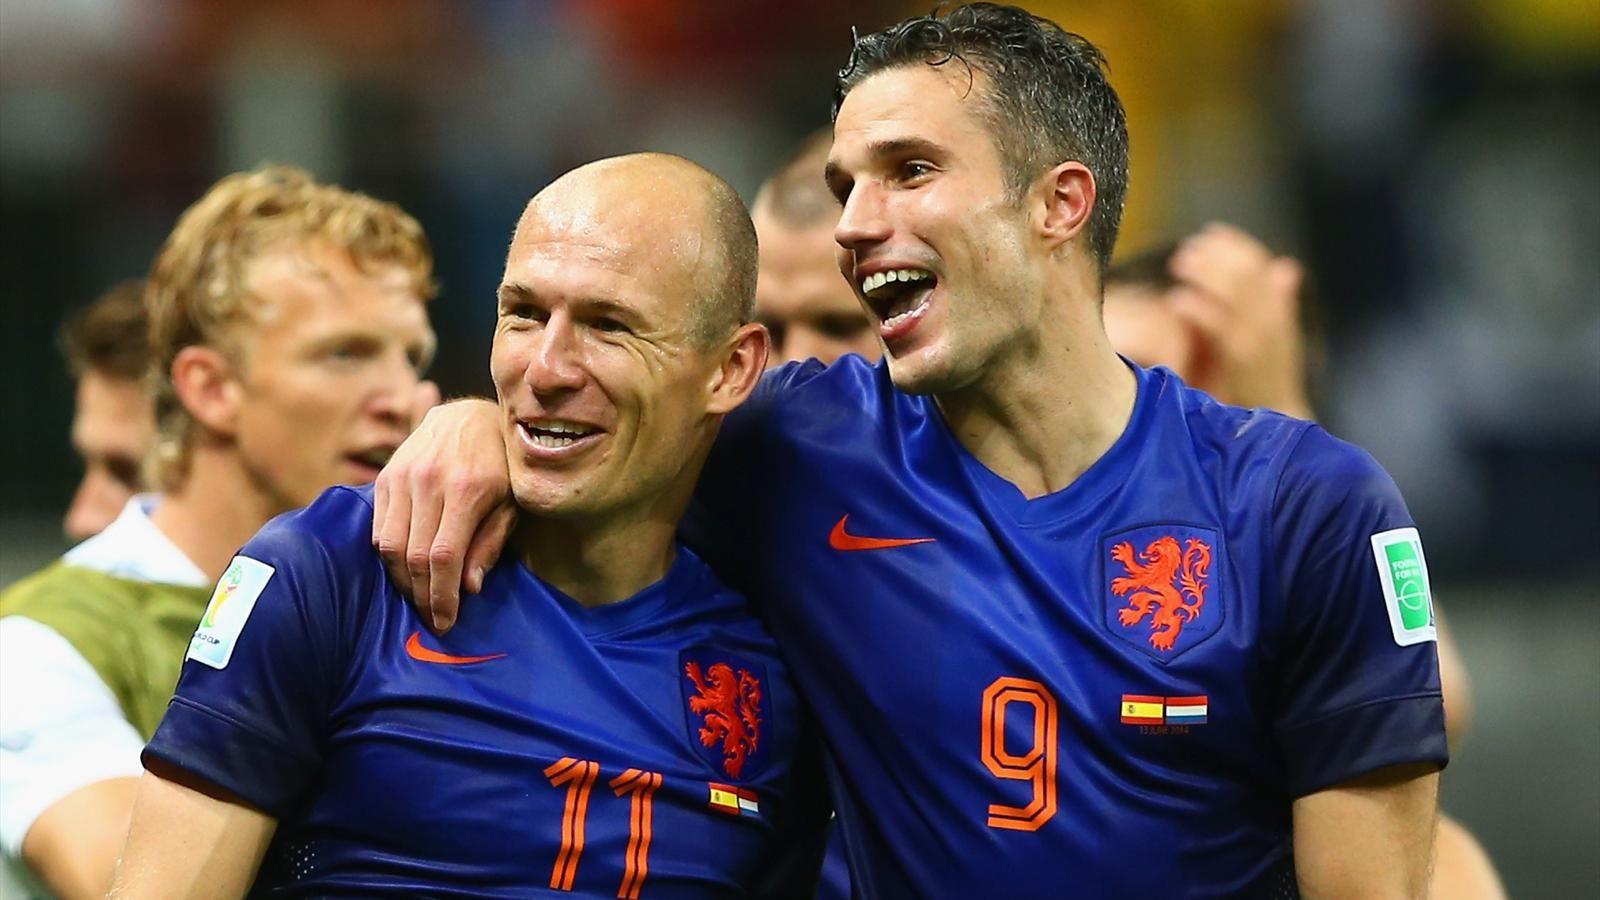 Robben persie goal celebration against spain for desktop ipad arjen robben and robin van persie scored two goals each voltagebd Images